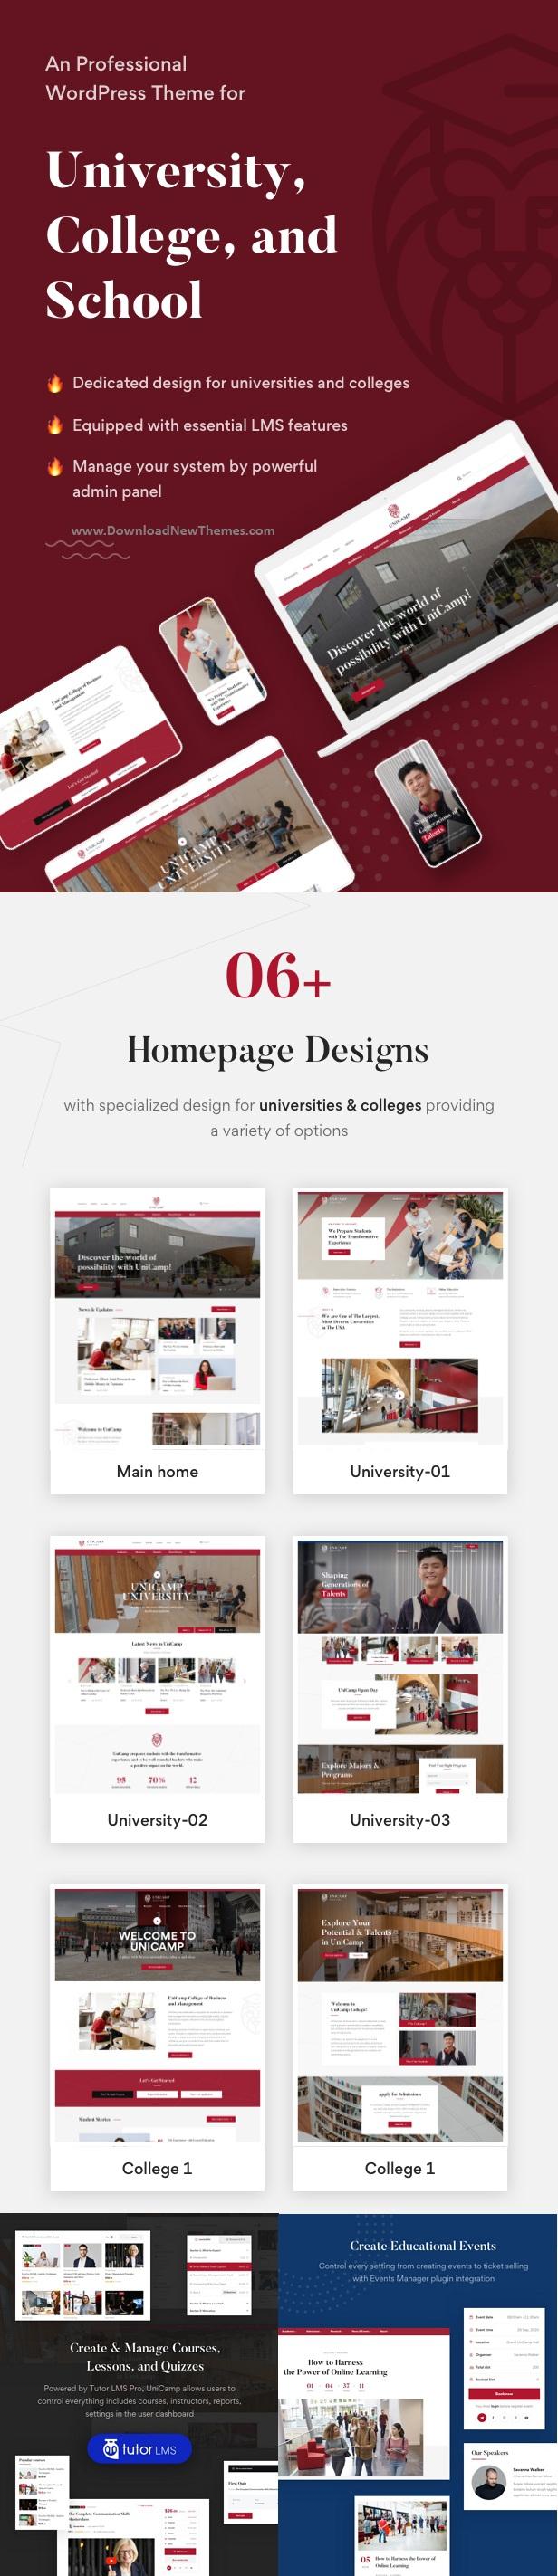 University and College WordPress Theme